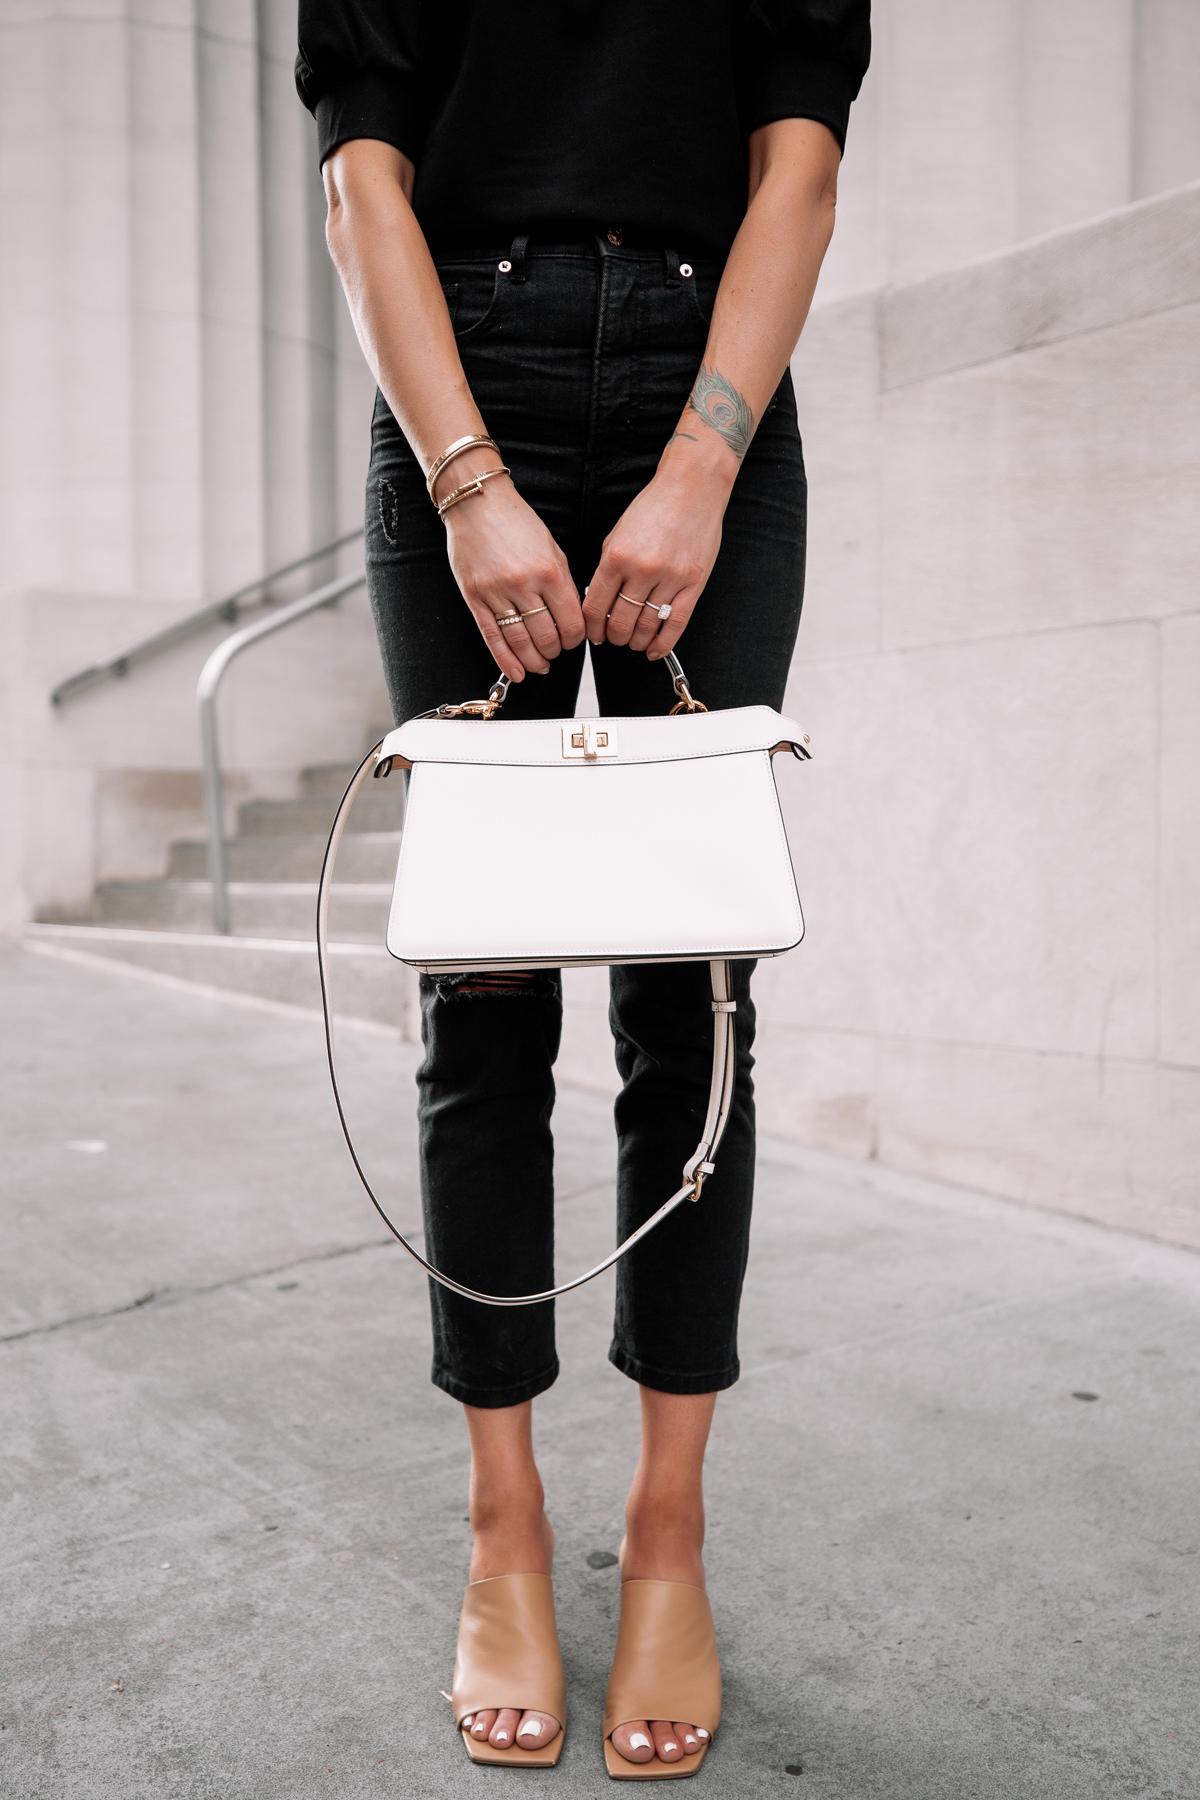 Fashion Jackson Wearing Black Top Black Ripped Jeans Nude Heeld Sandals Fendi White Peekaboo Handbag